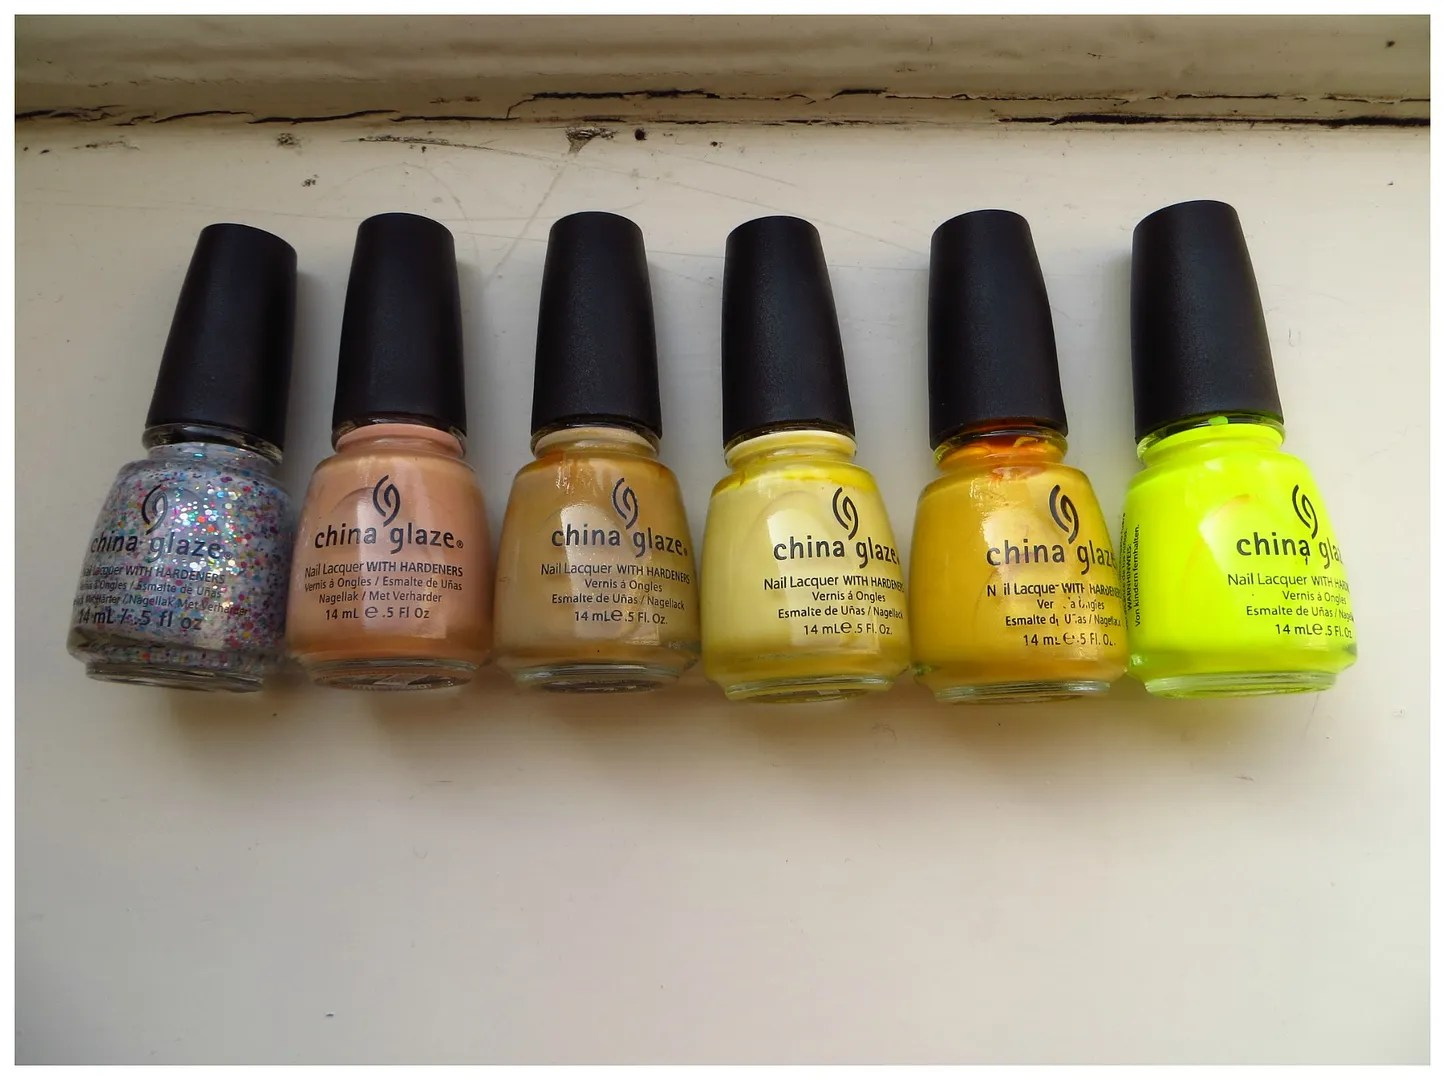 High end nail polish stash – Floating in dreams